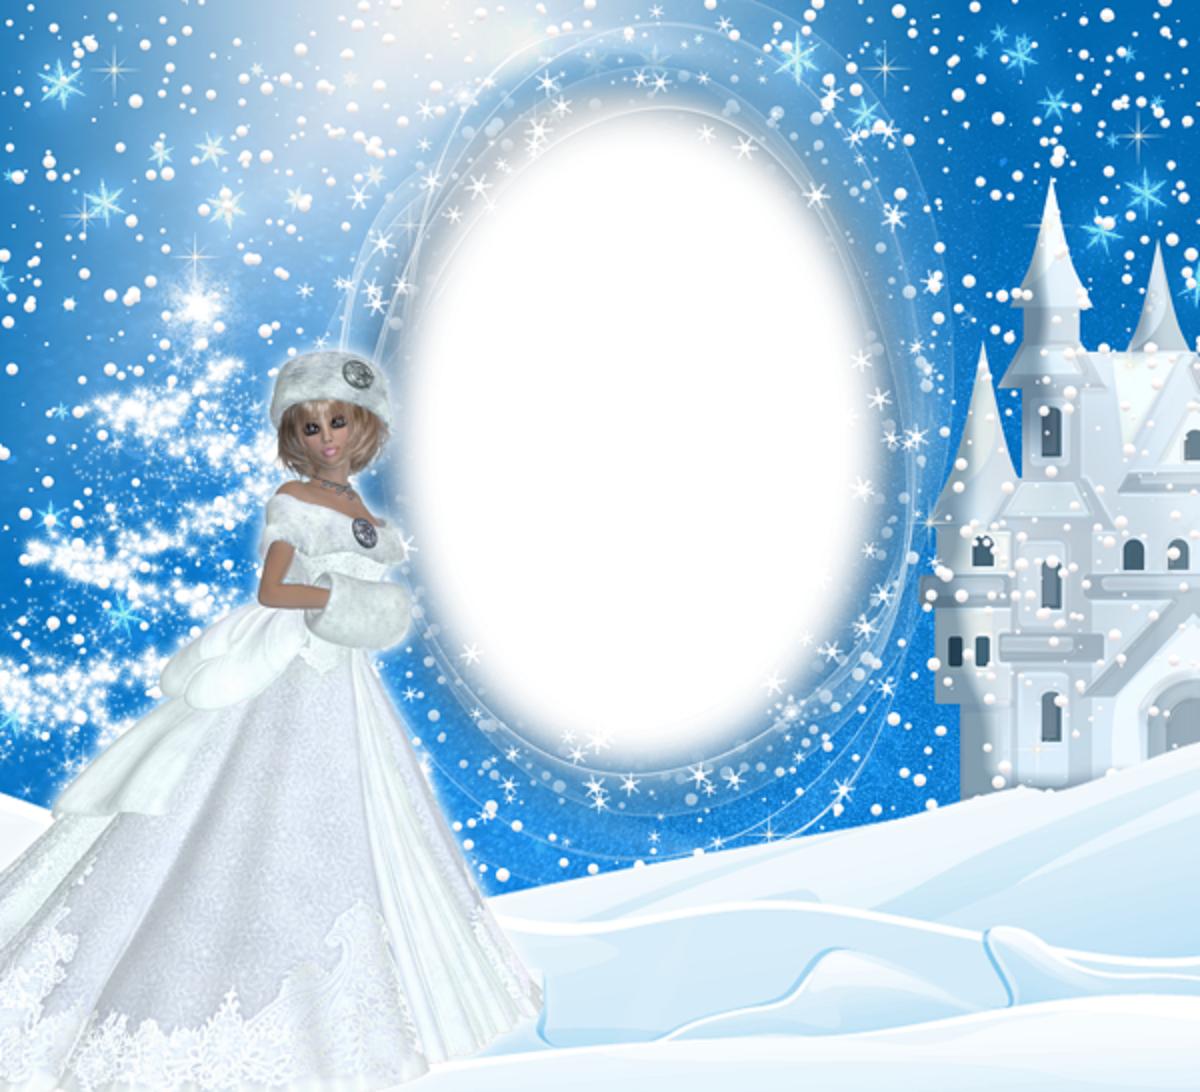 Cute Pink Snowman Wallpaper Photoshop Frames Wallpapers Free Downloads Beautiful